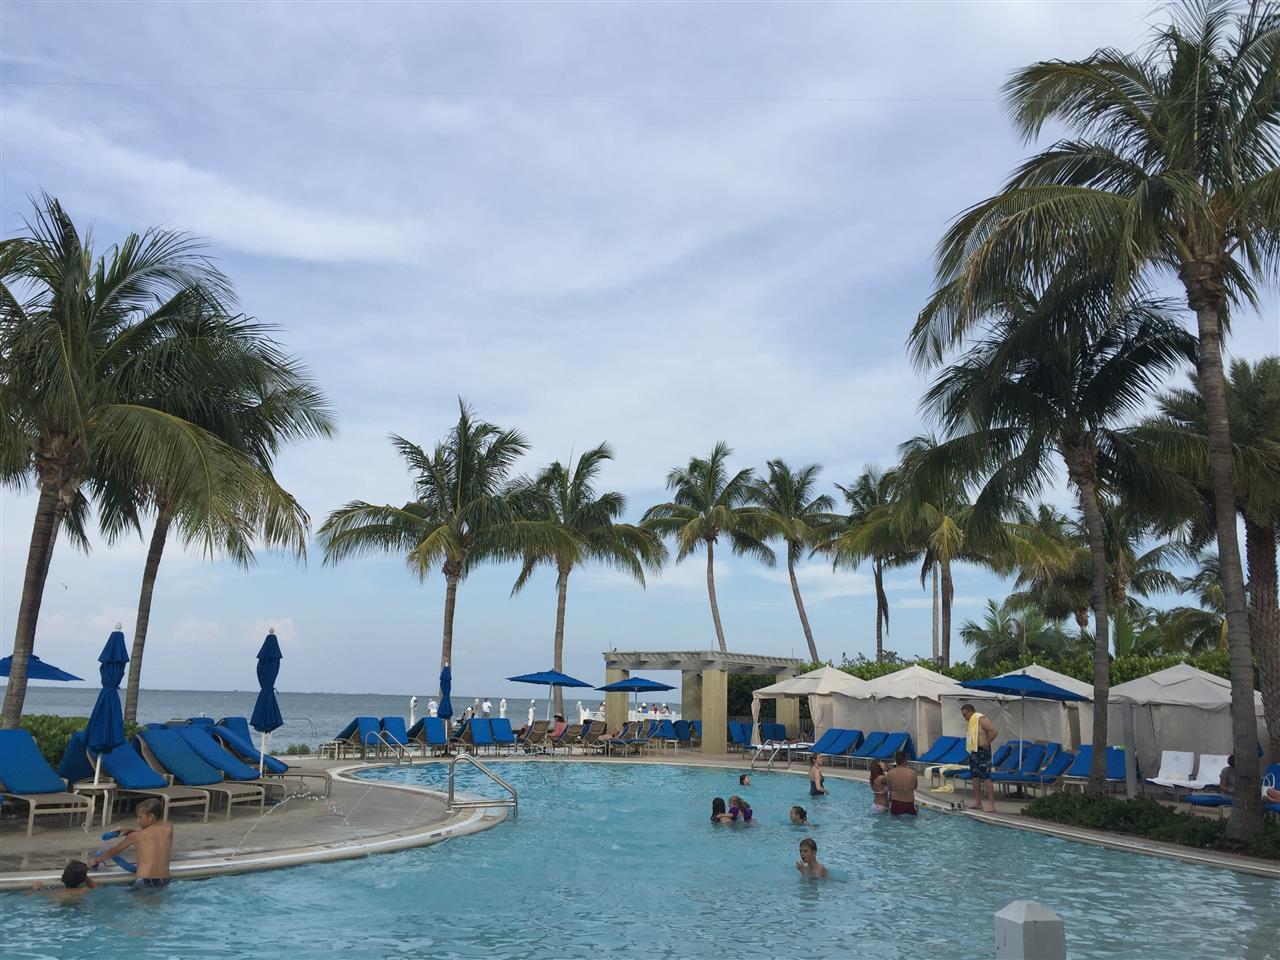 Southseas Resort #Sanibel/Captiva #Lee County Florida